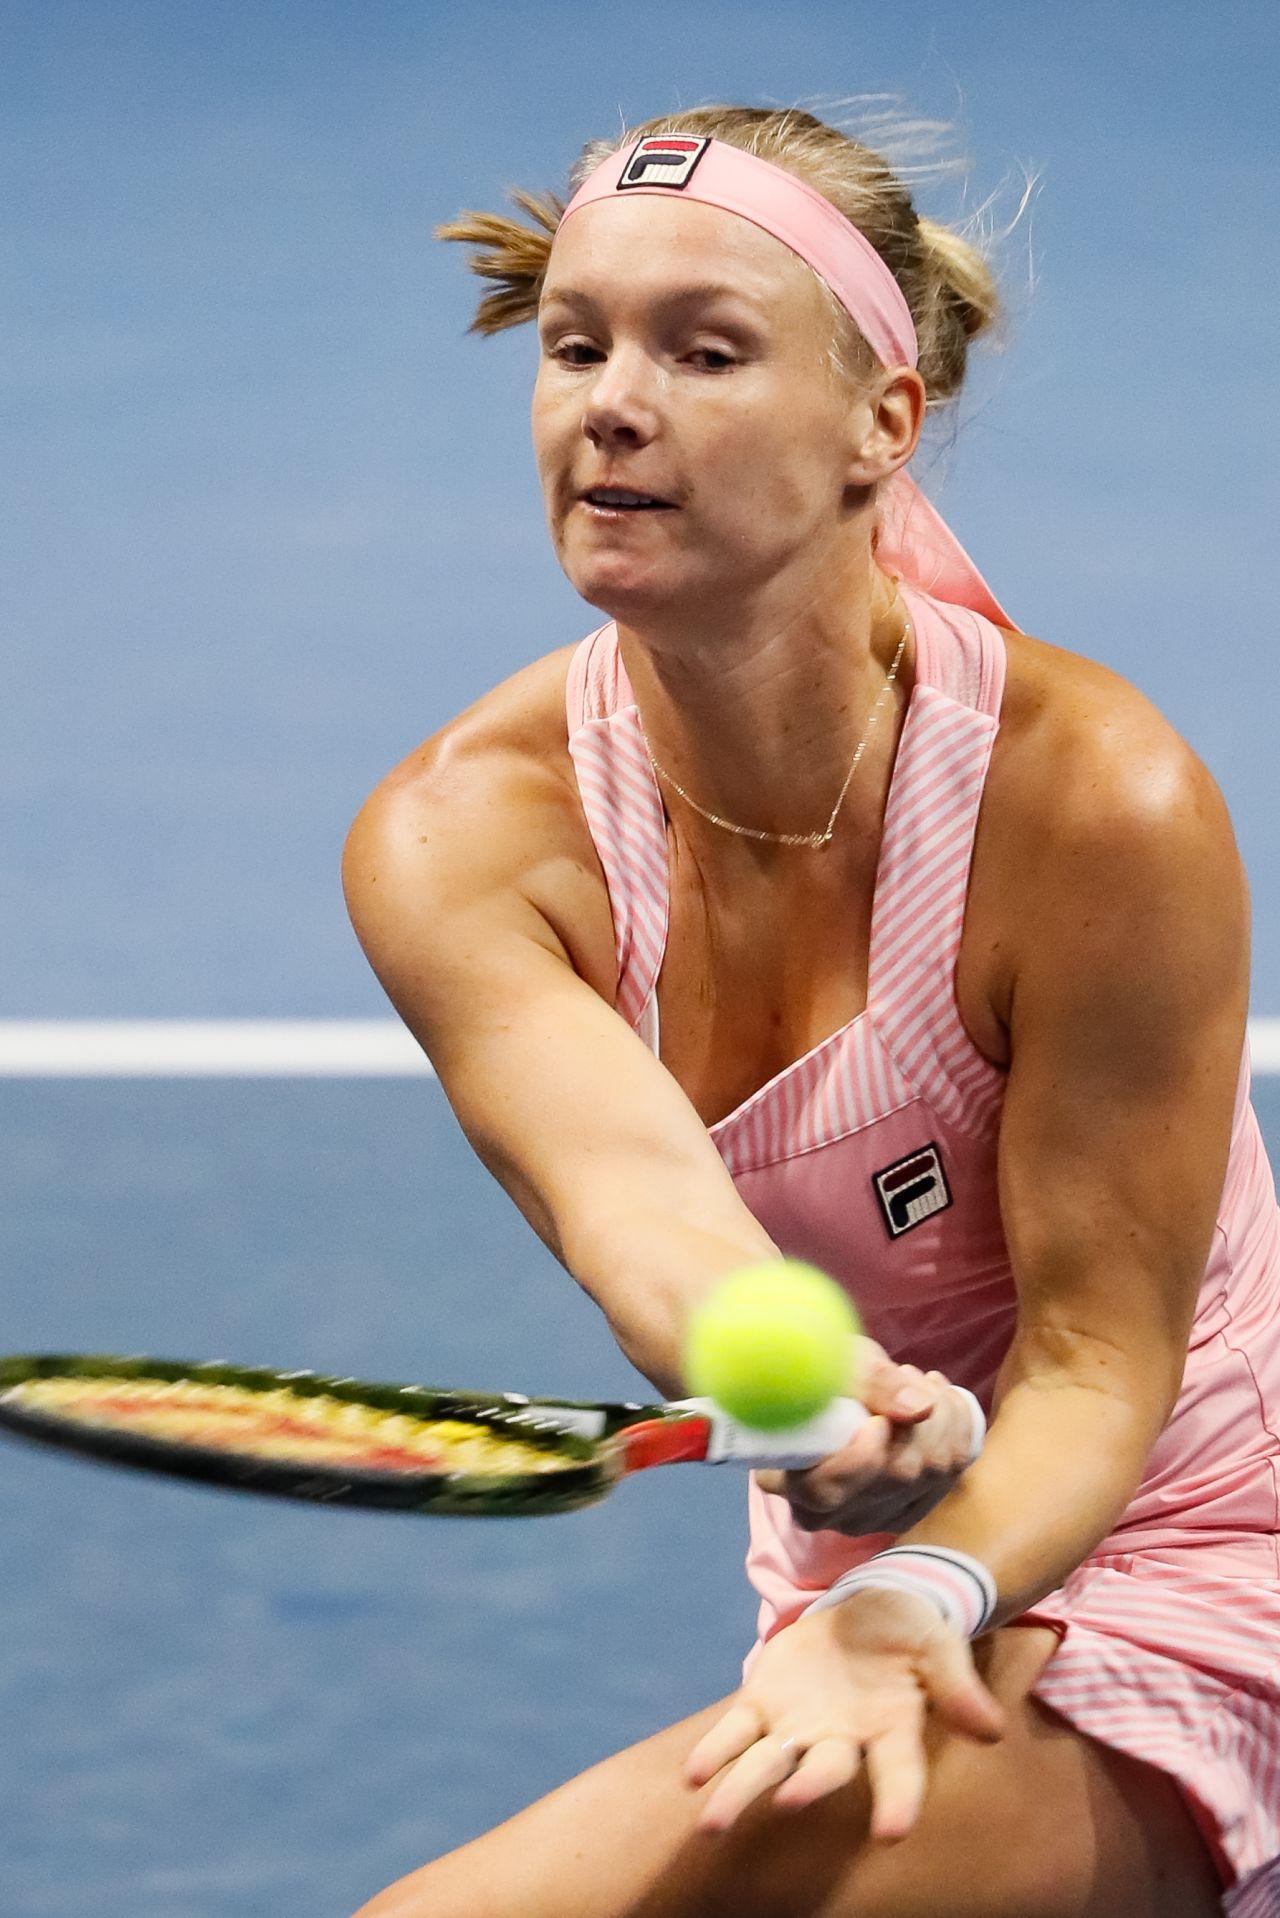 Kiki Bertens is excited to play in WTA Finals - Thewinin  |Kiki Bertens